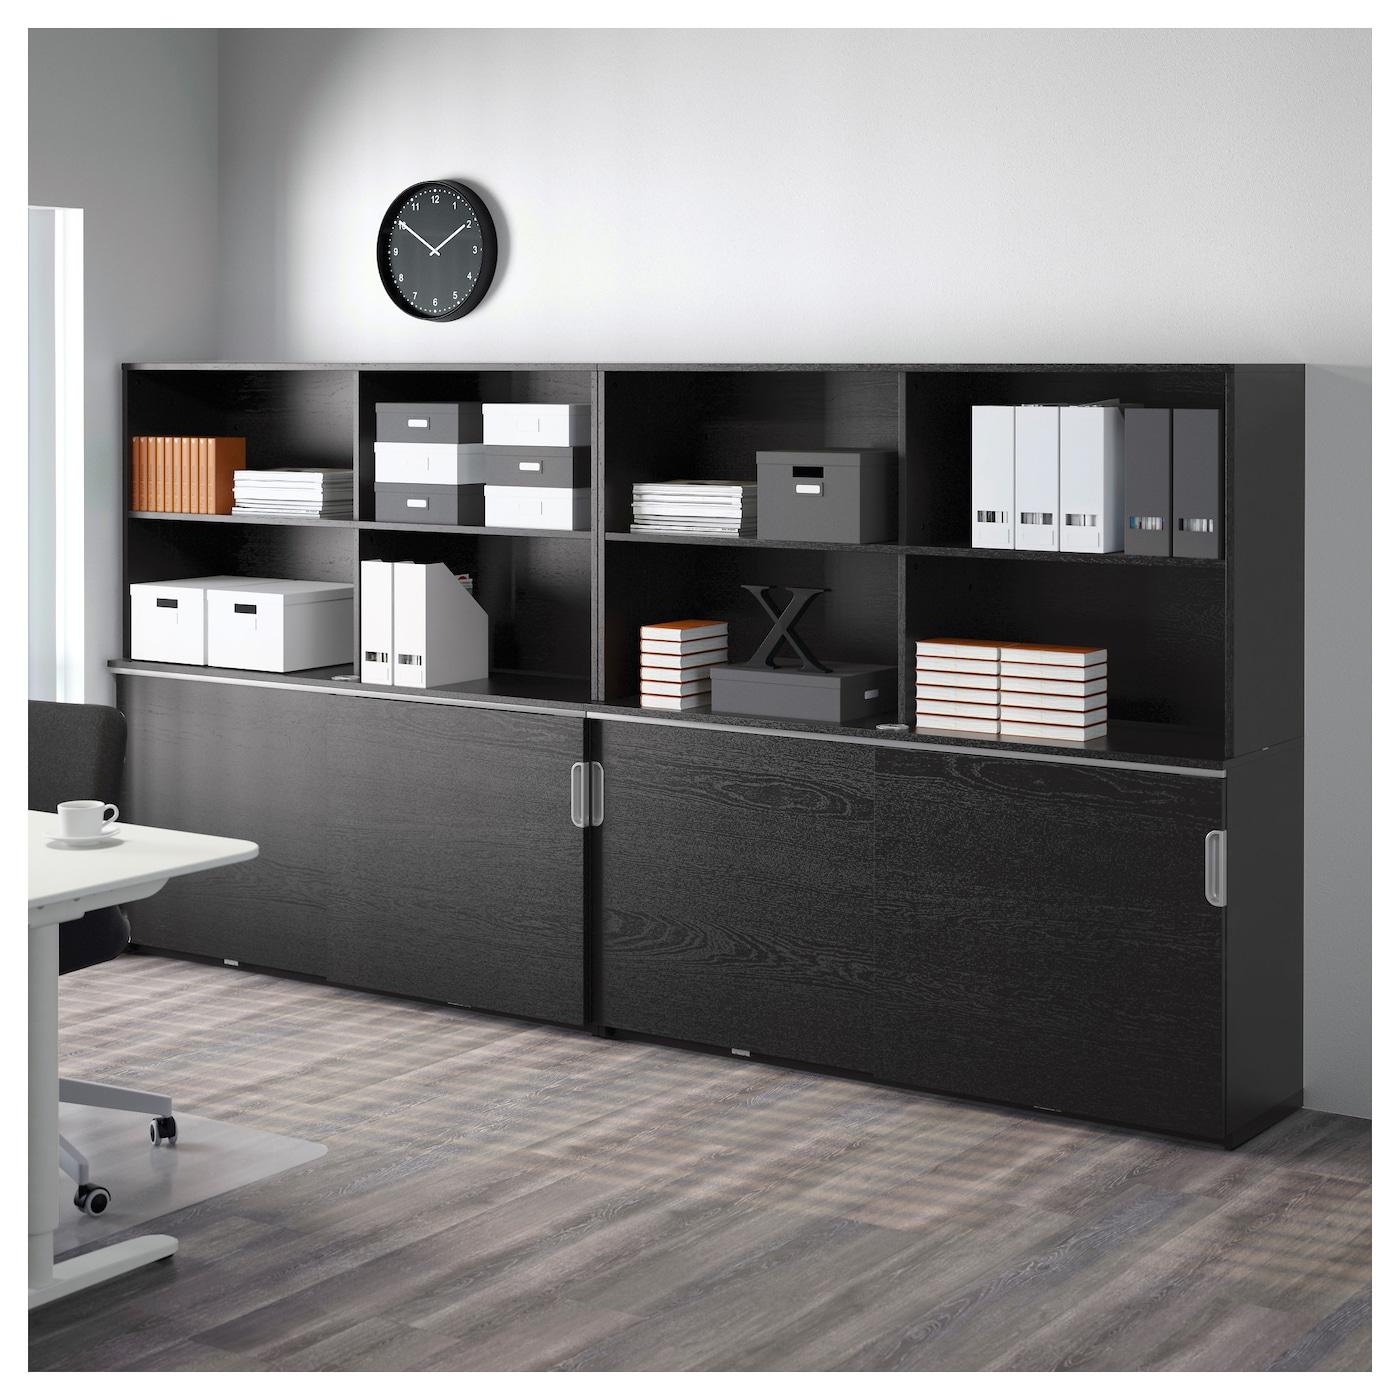 galant storage combination w sliding doors black brown 320 x 160 cm ikea. Black Bedroom Furniture Sets. Home Design Ideas